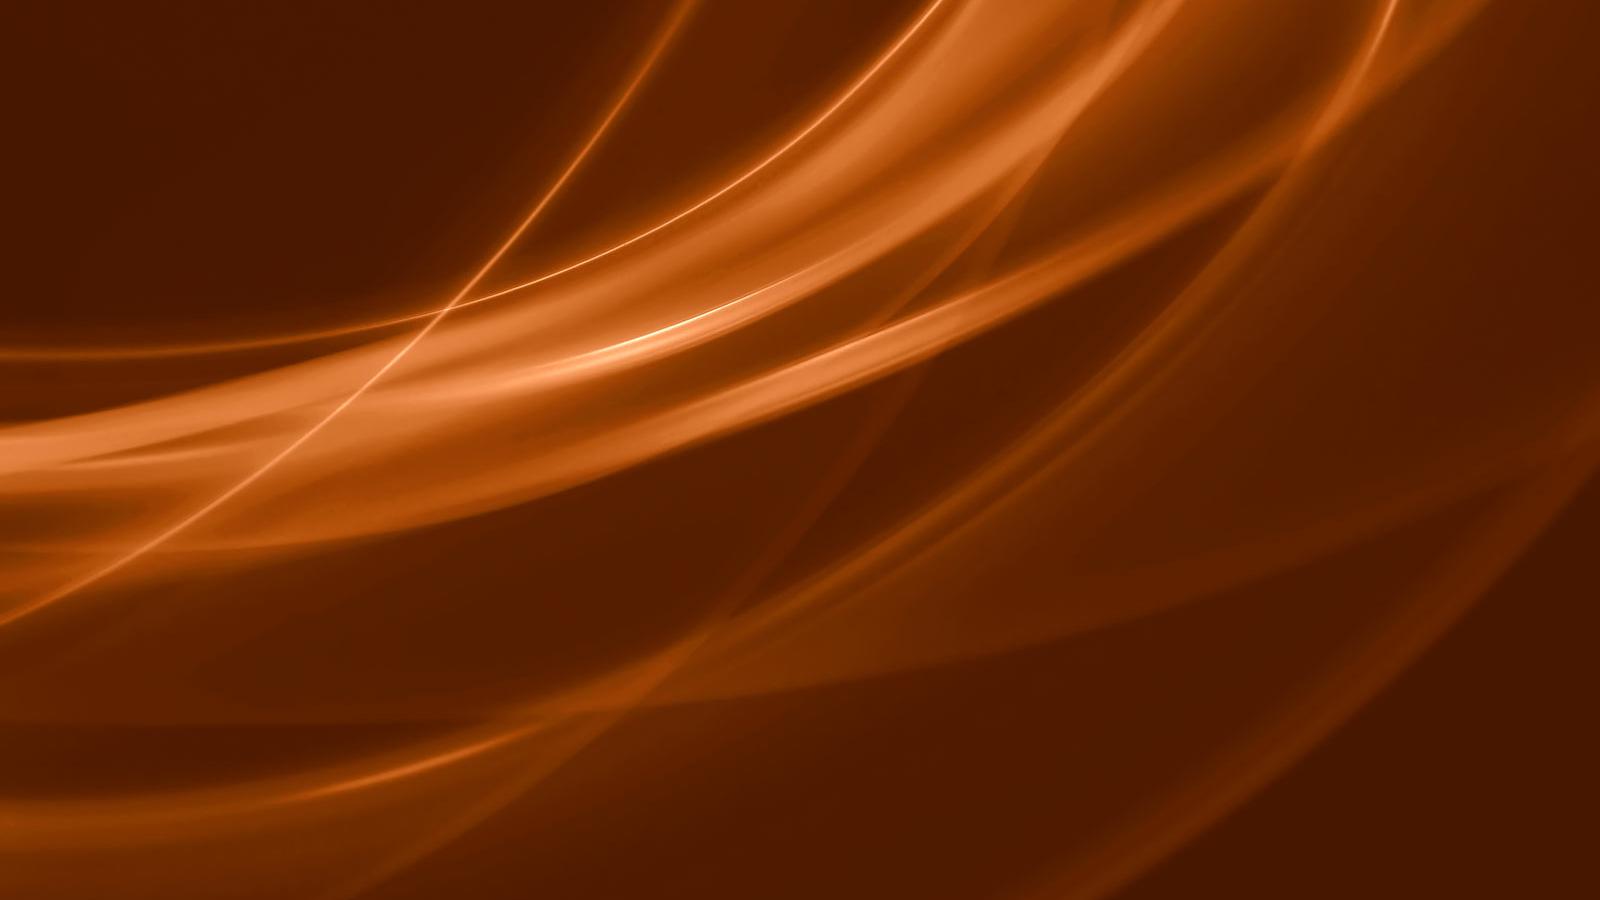 1600x1200px Brown Abstract Wallpaper - WallpaperSafari